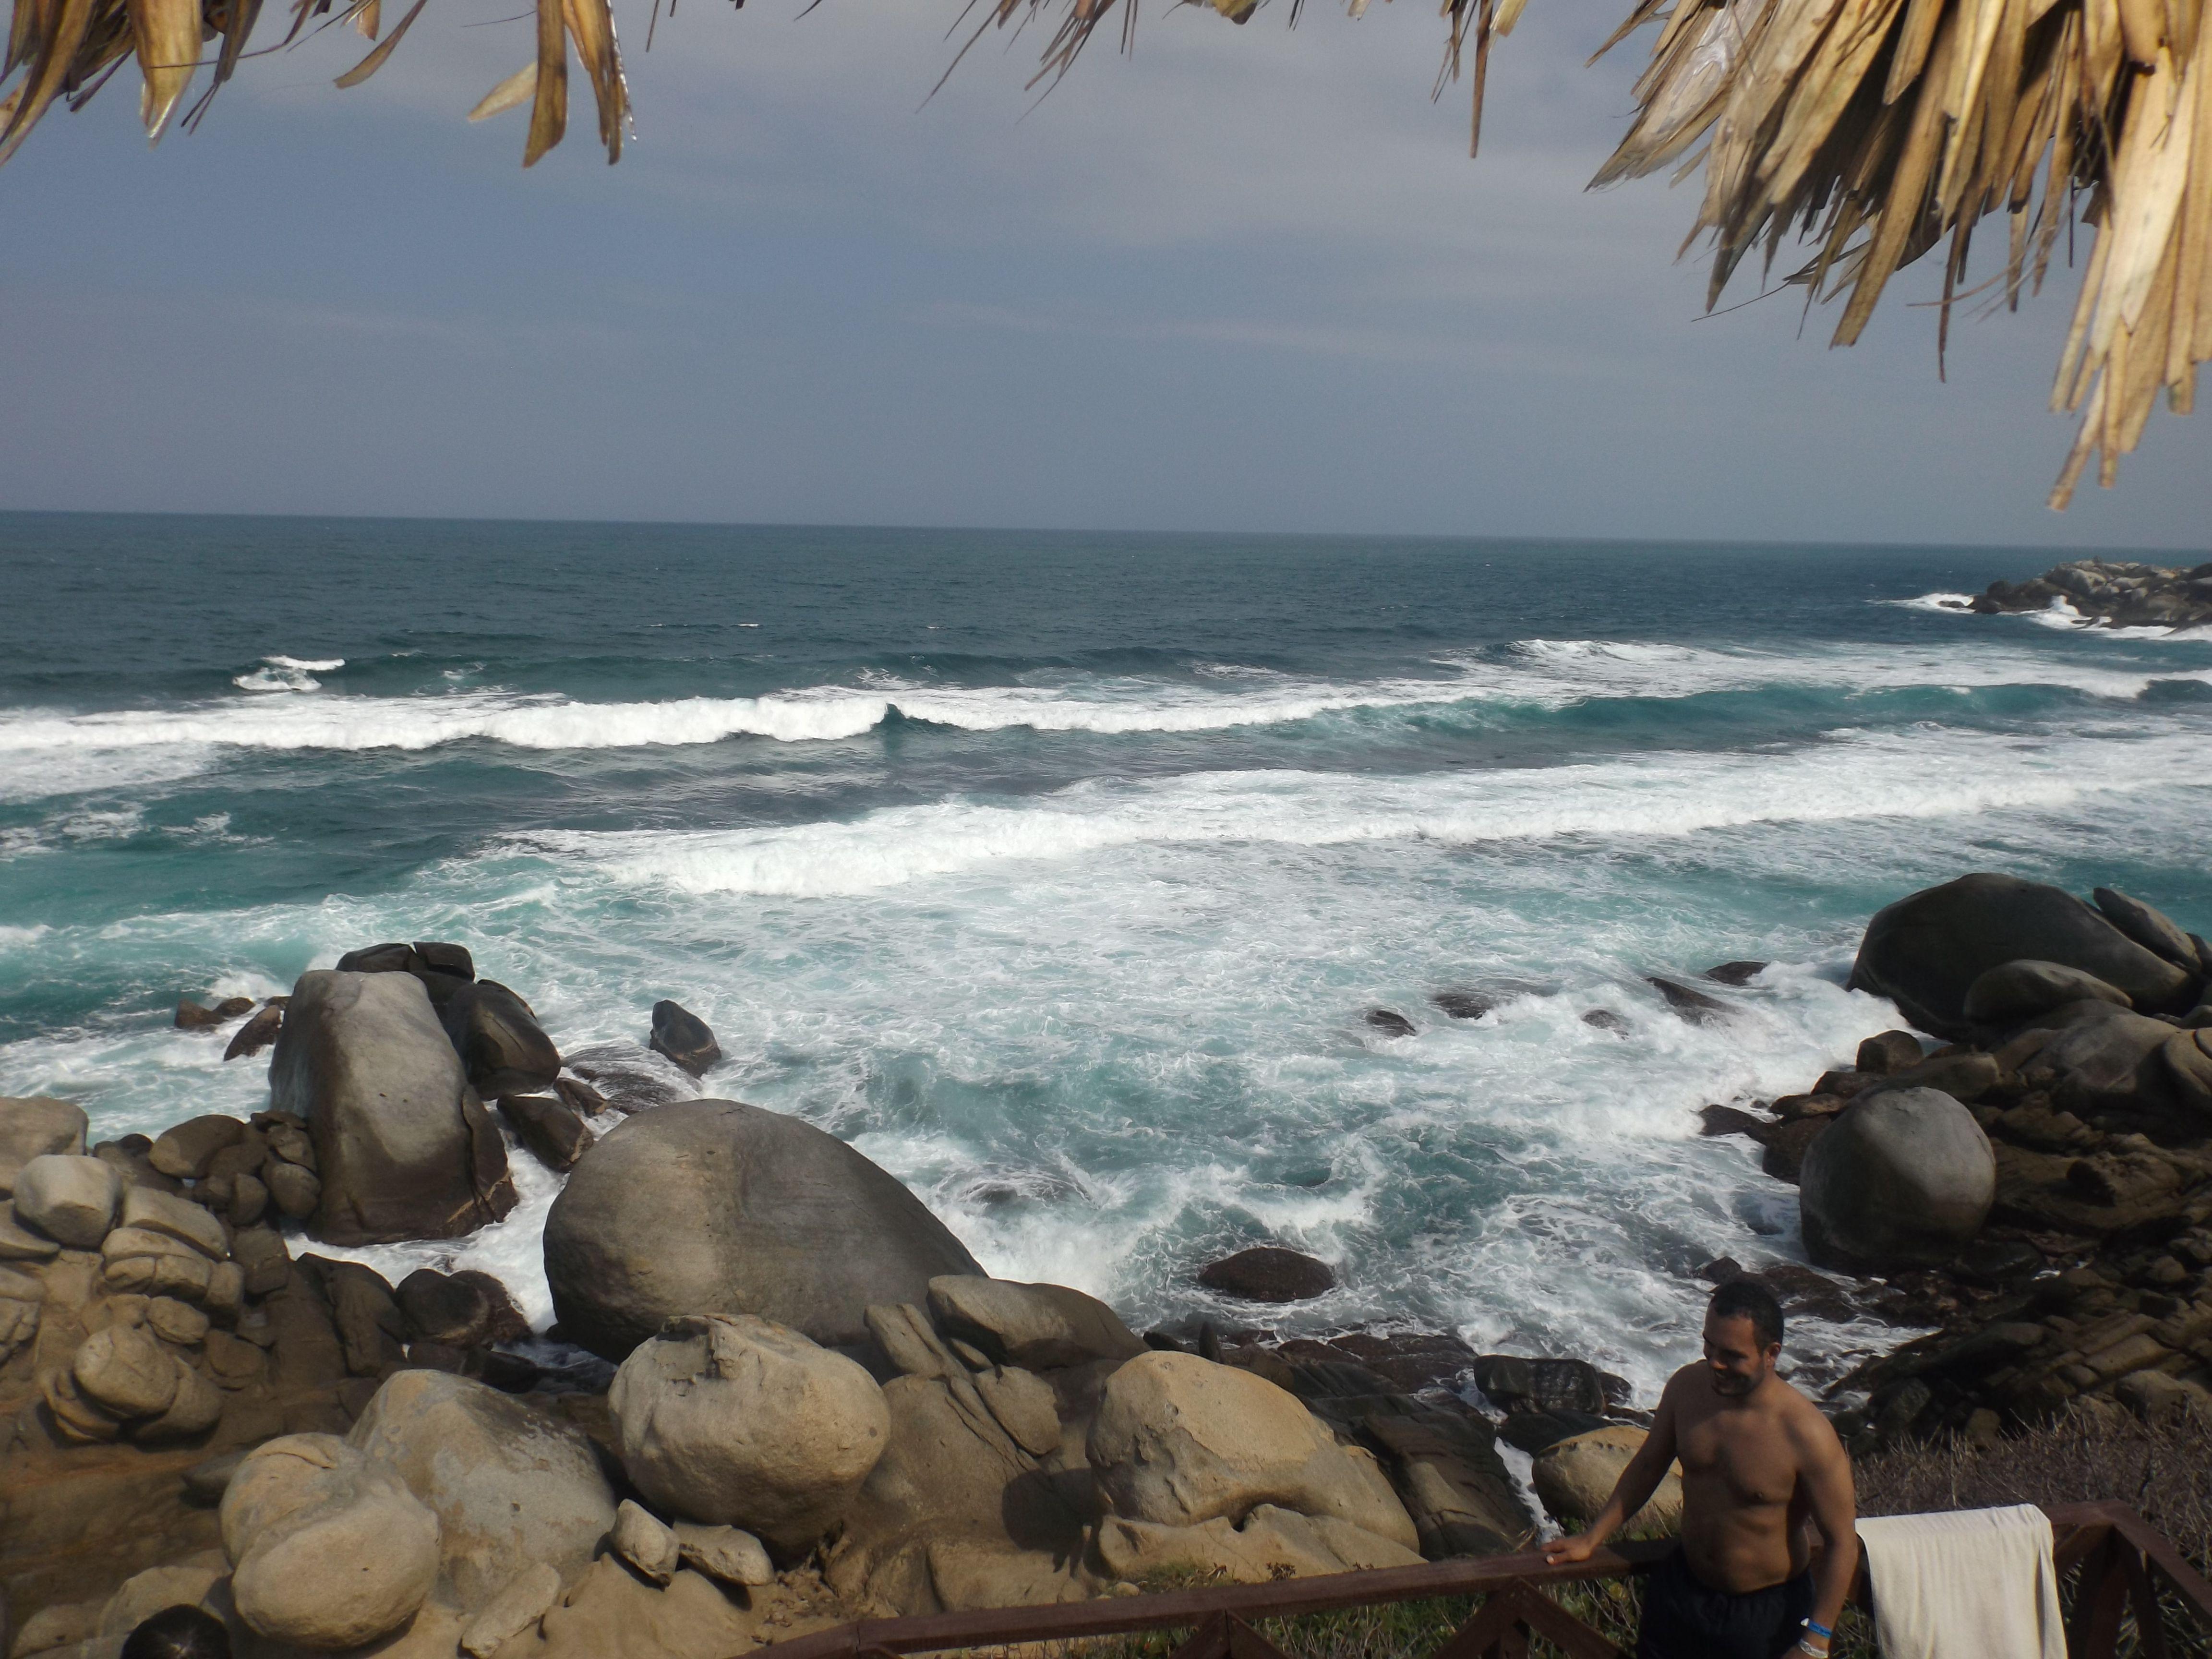 WONDERFUL PLACE FOR ENJOY #BEACH #NATURE #TAYRONAPARK #BEAUTIFUL #SUN